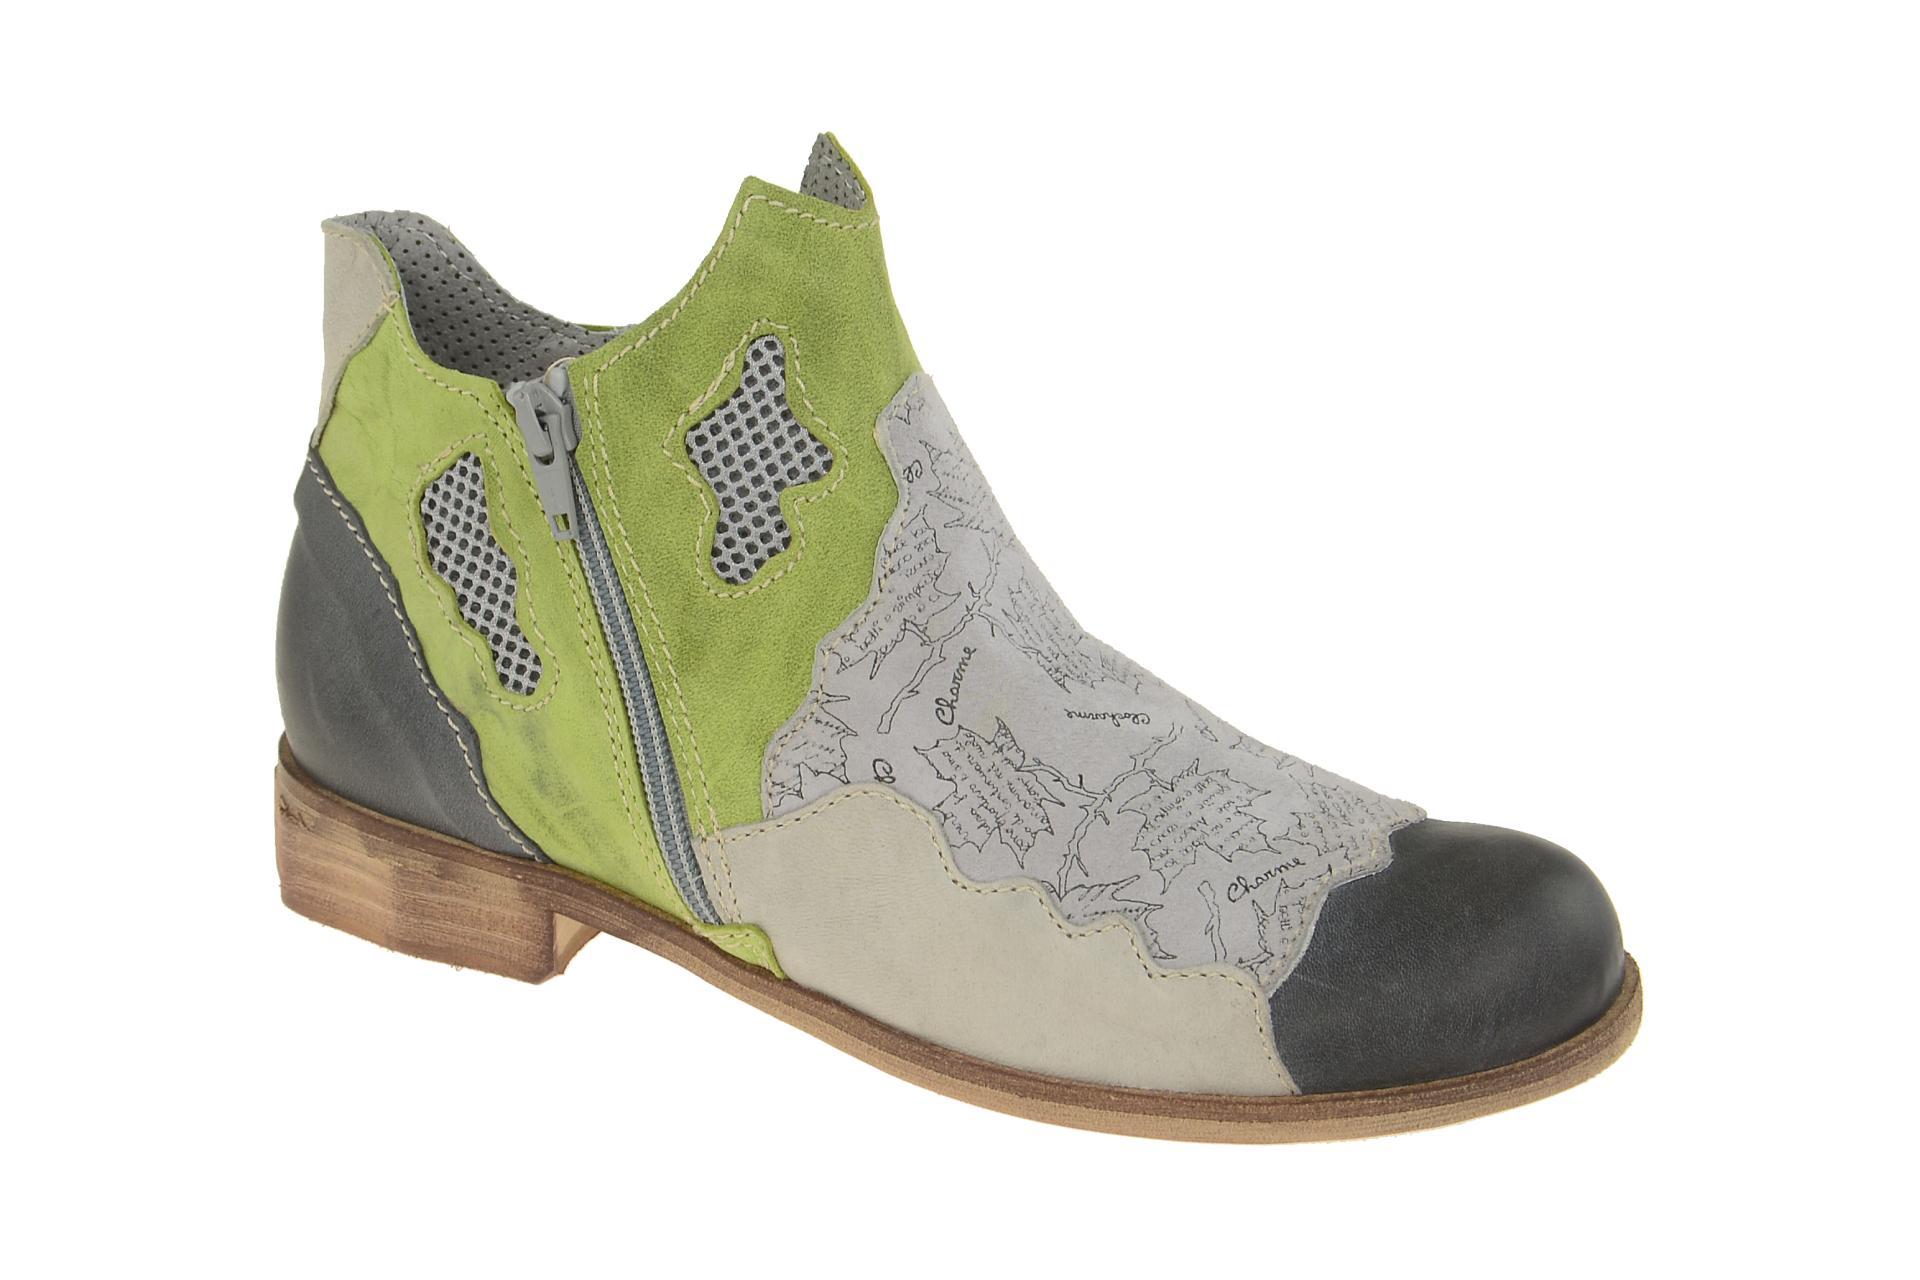 brand new 11470 383d8 Charme Stiefelette blau grau grün Gr 36, 38 - 0257-E